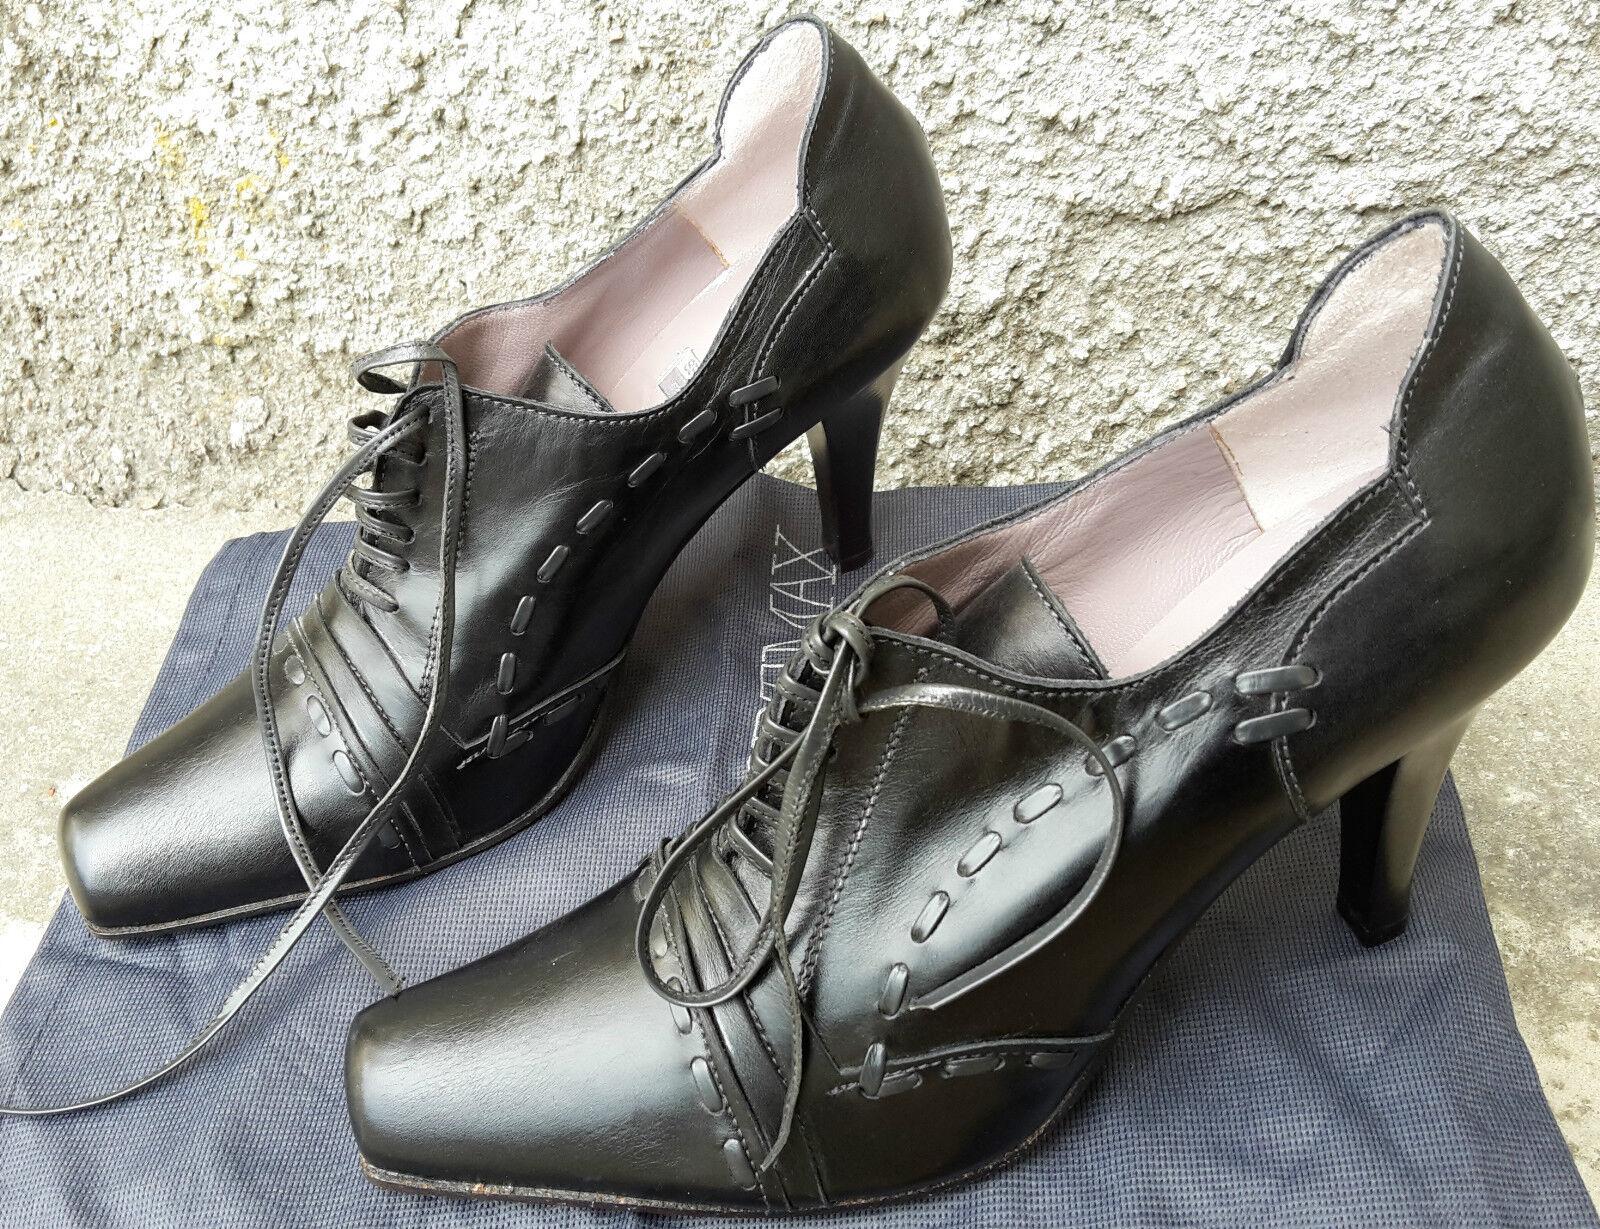 grande sconto Scarpe Scarpe Scarpe Scarpa Donna Francesine SPORTMAX Pelle Nera tacco 9cm n. 36 260 euro  prezzi bassissimi